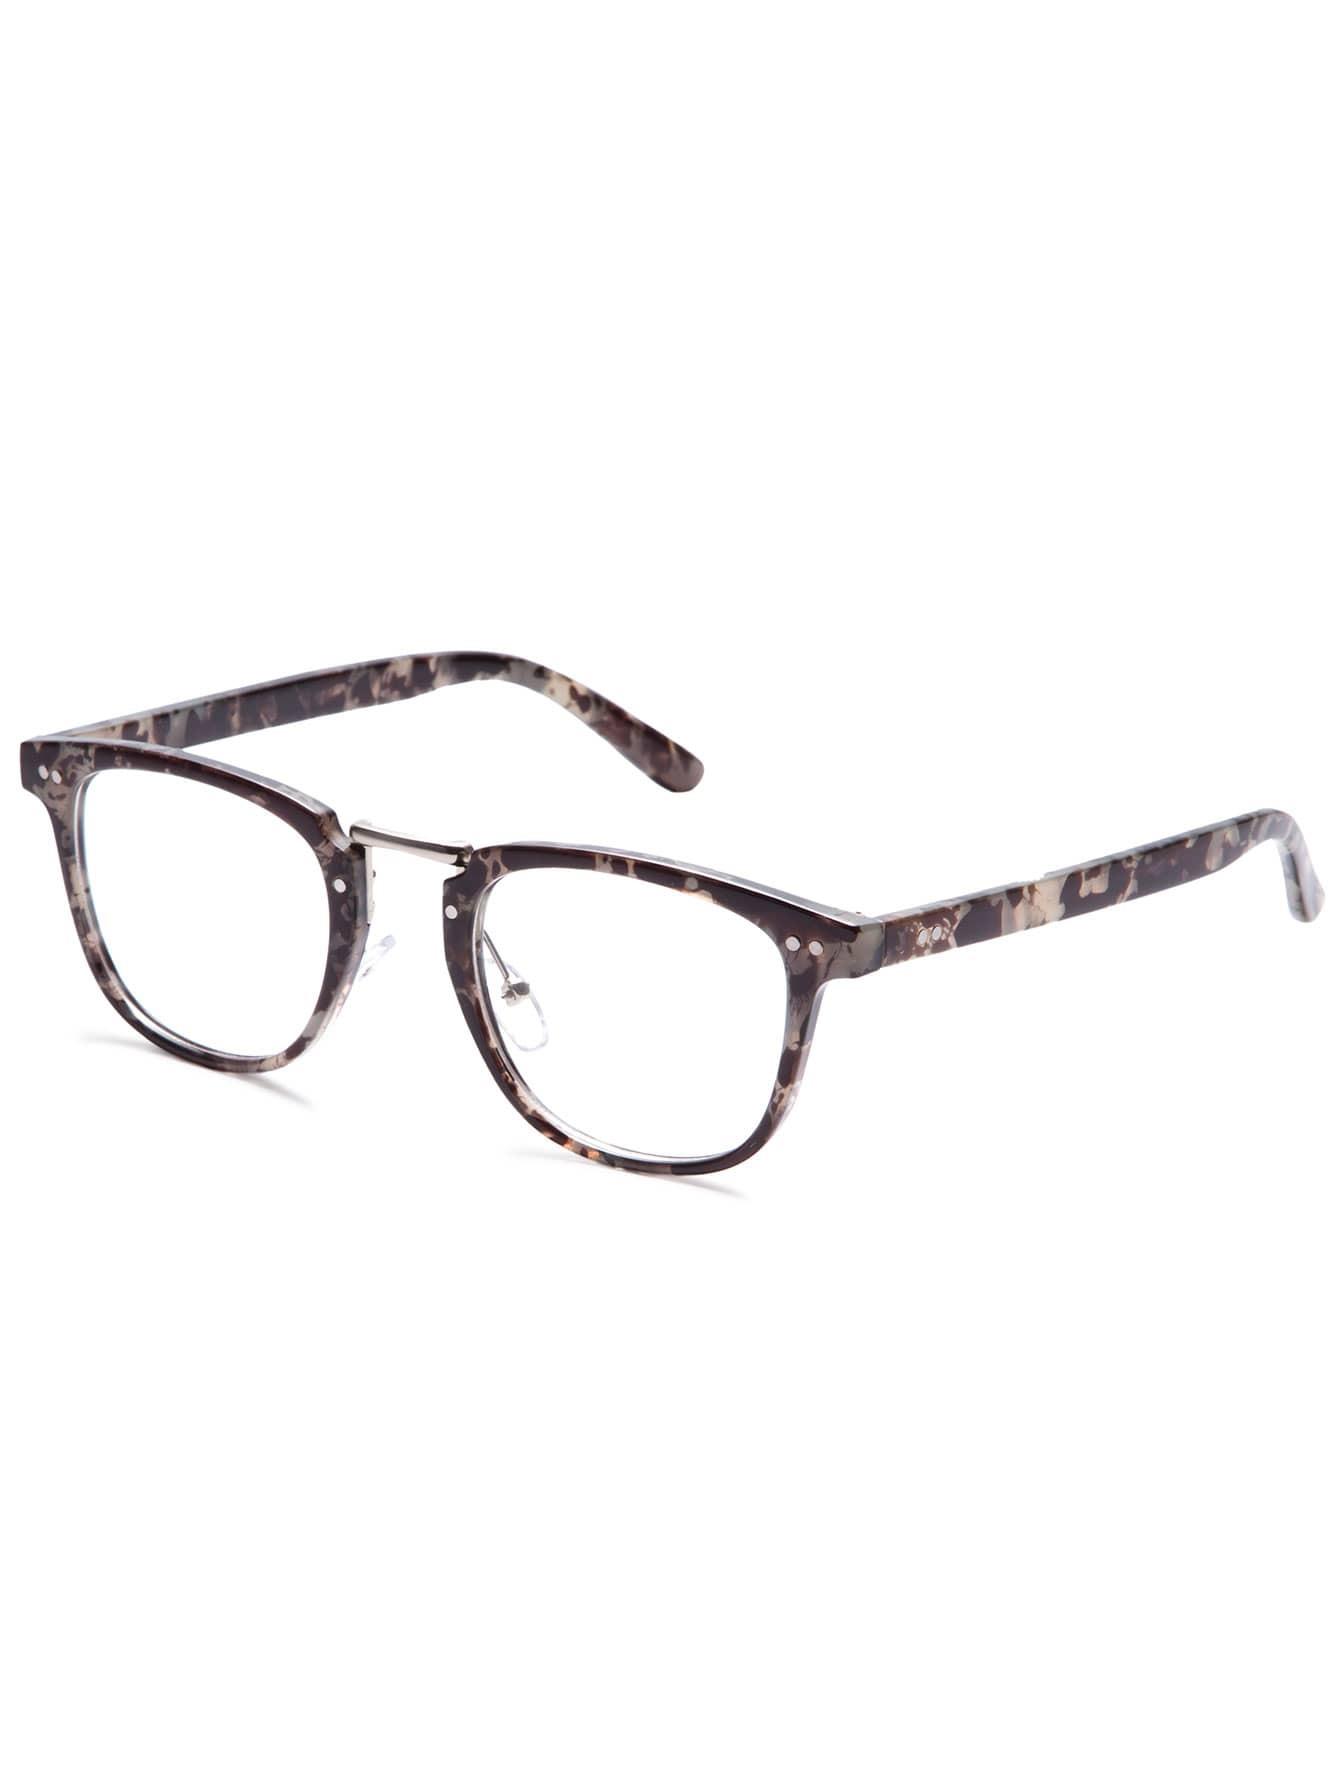 Grey Tortoise Frame Clear Lens Glasses sunglass160909307